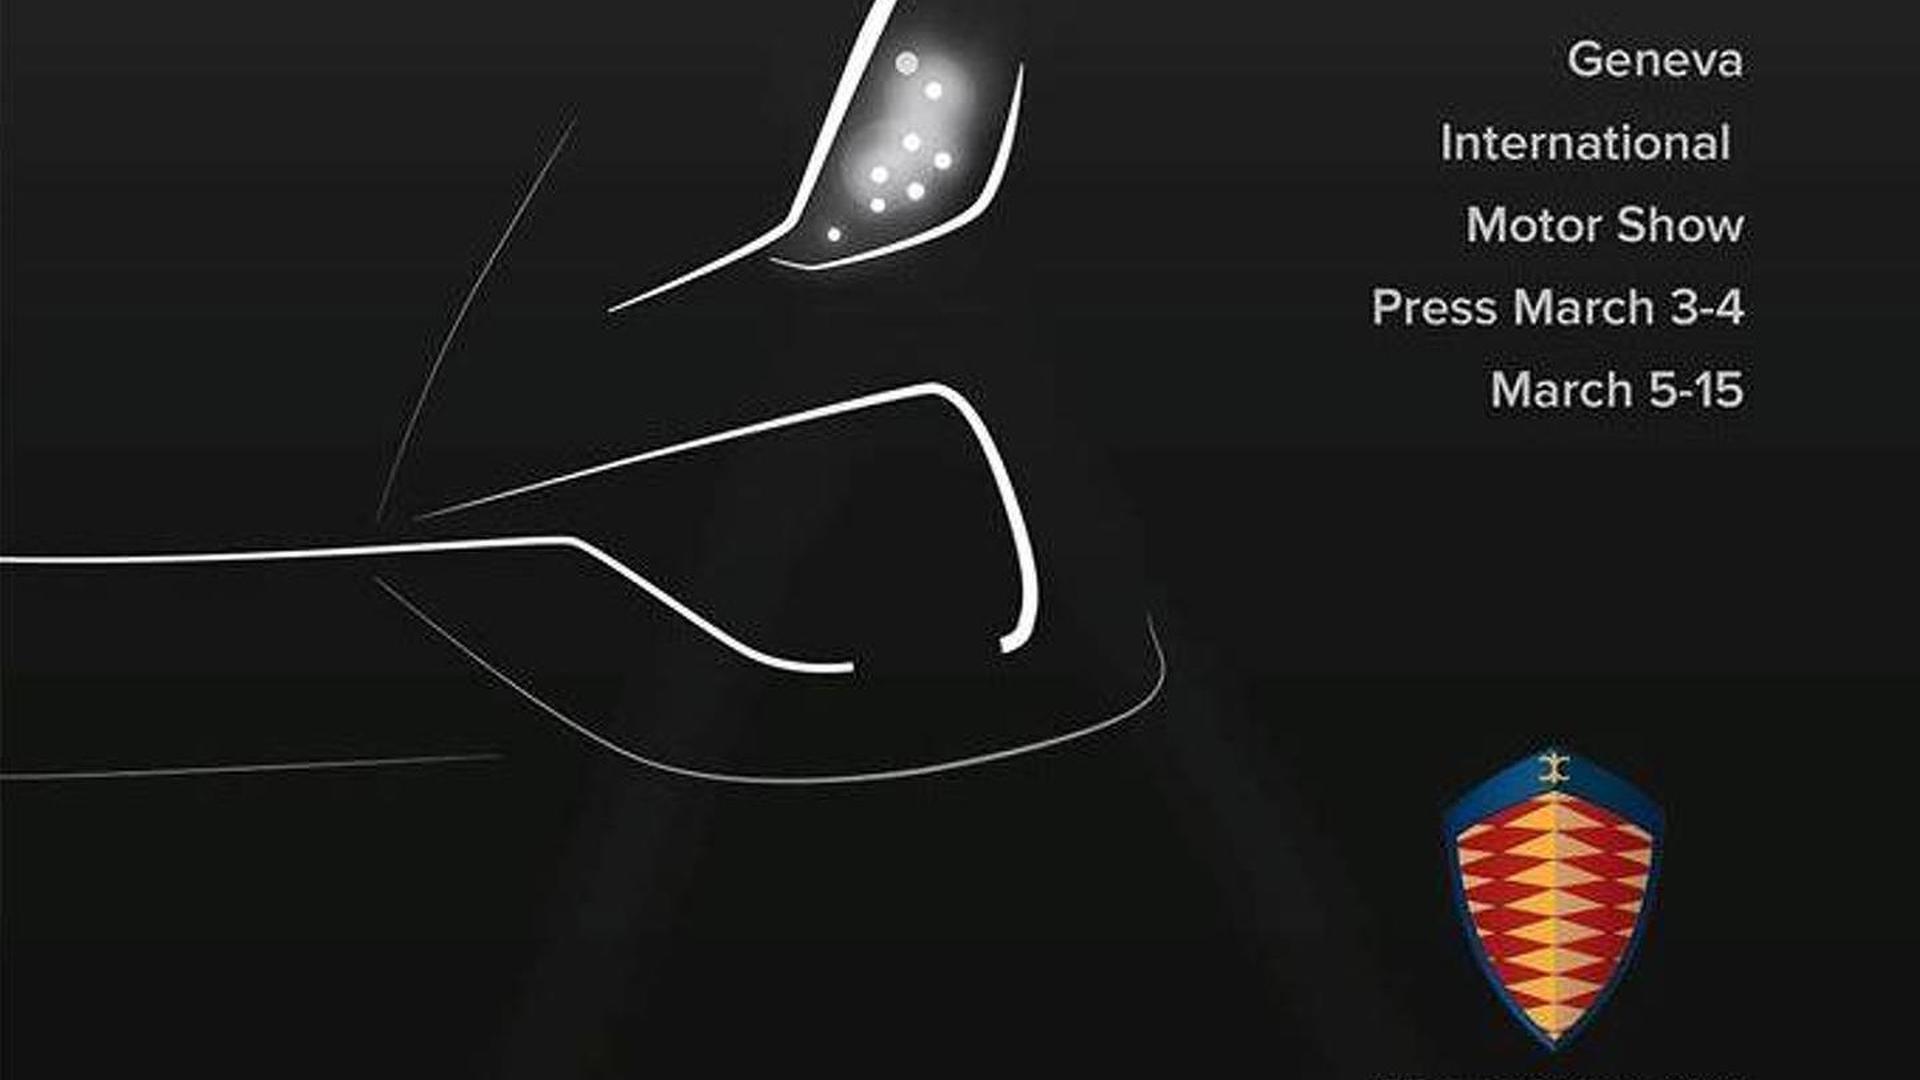 Koenigsegg Regera teased again